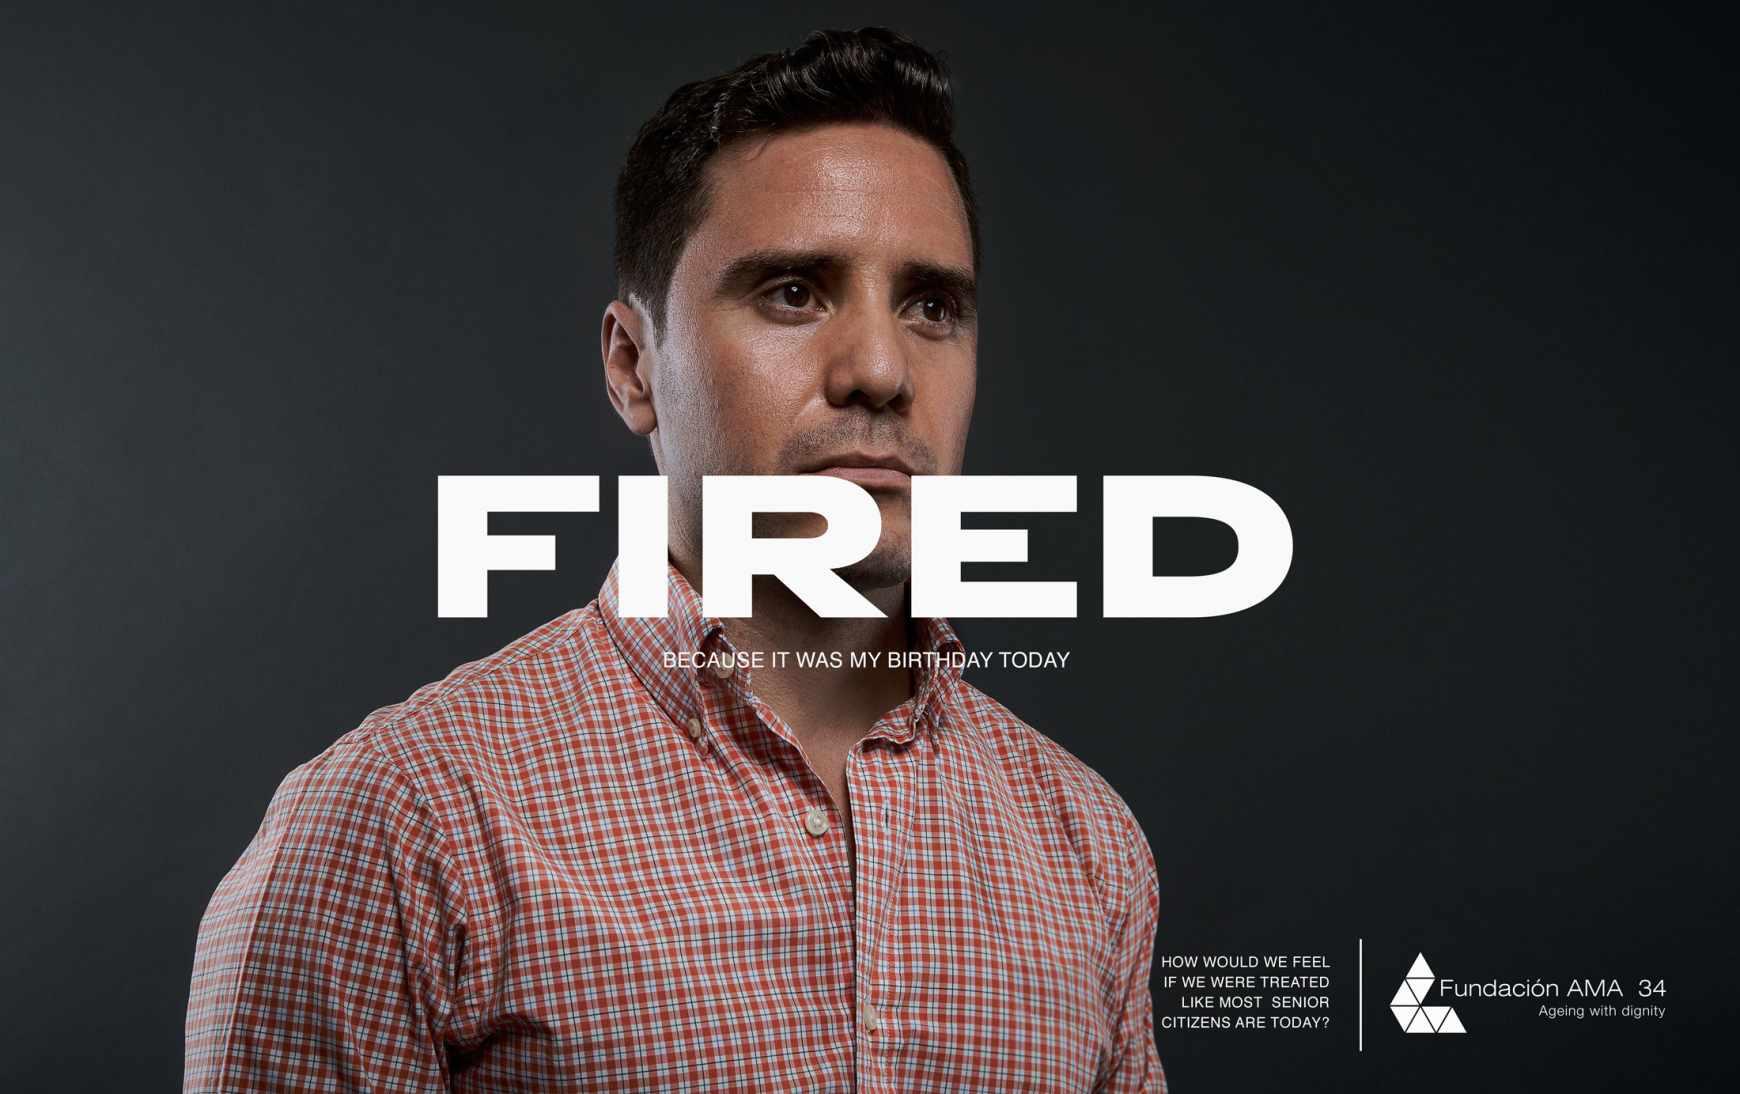 AMA 34 Foundation Print Ad - Fired